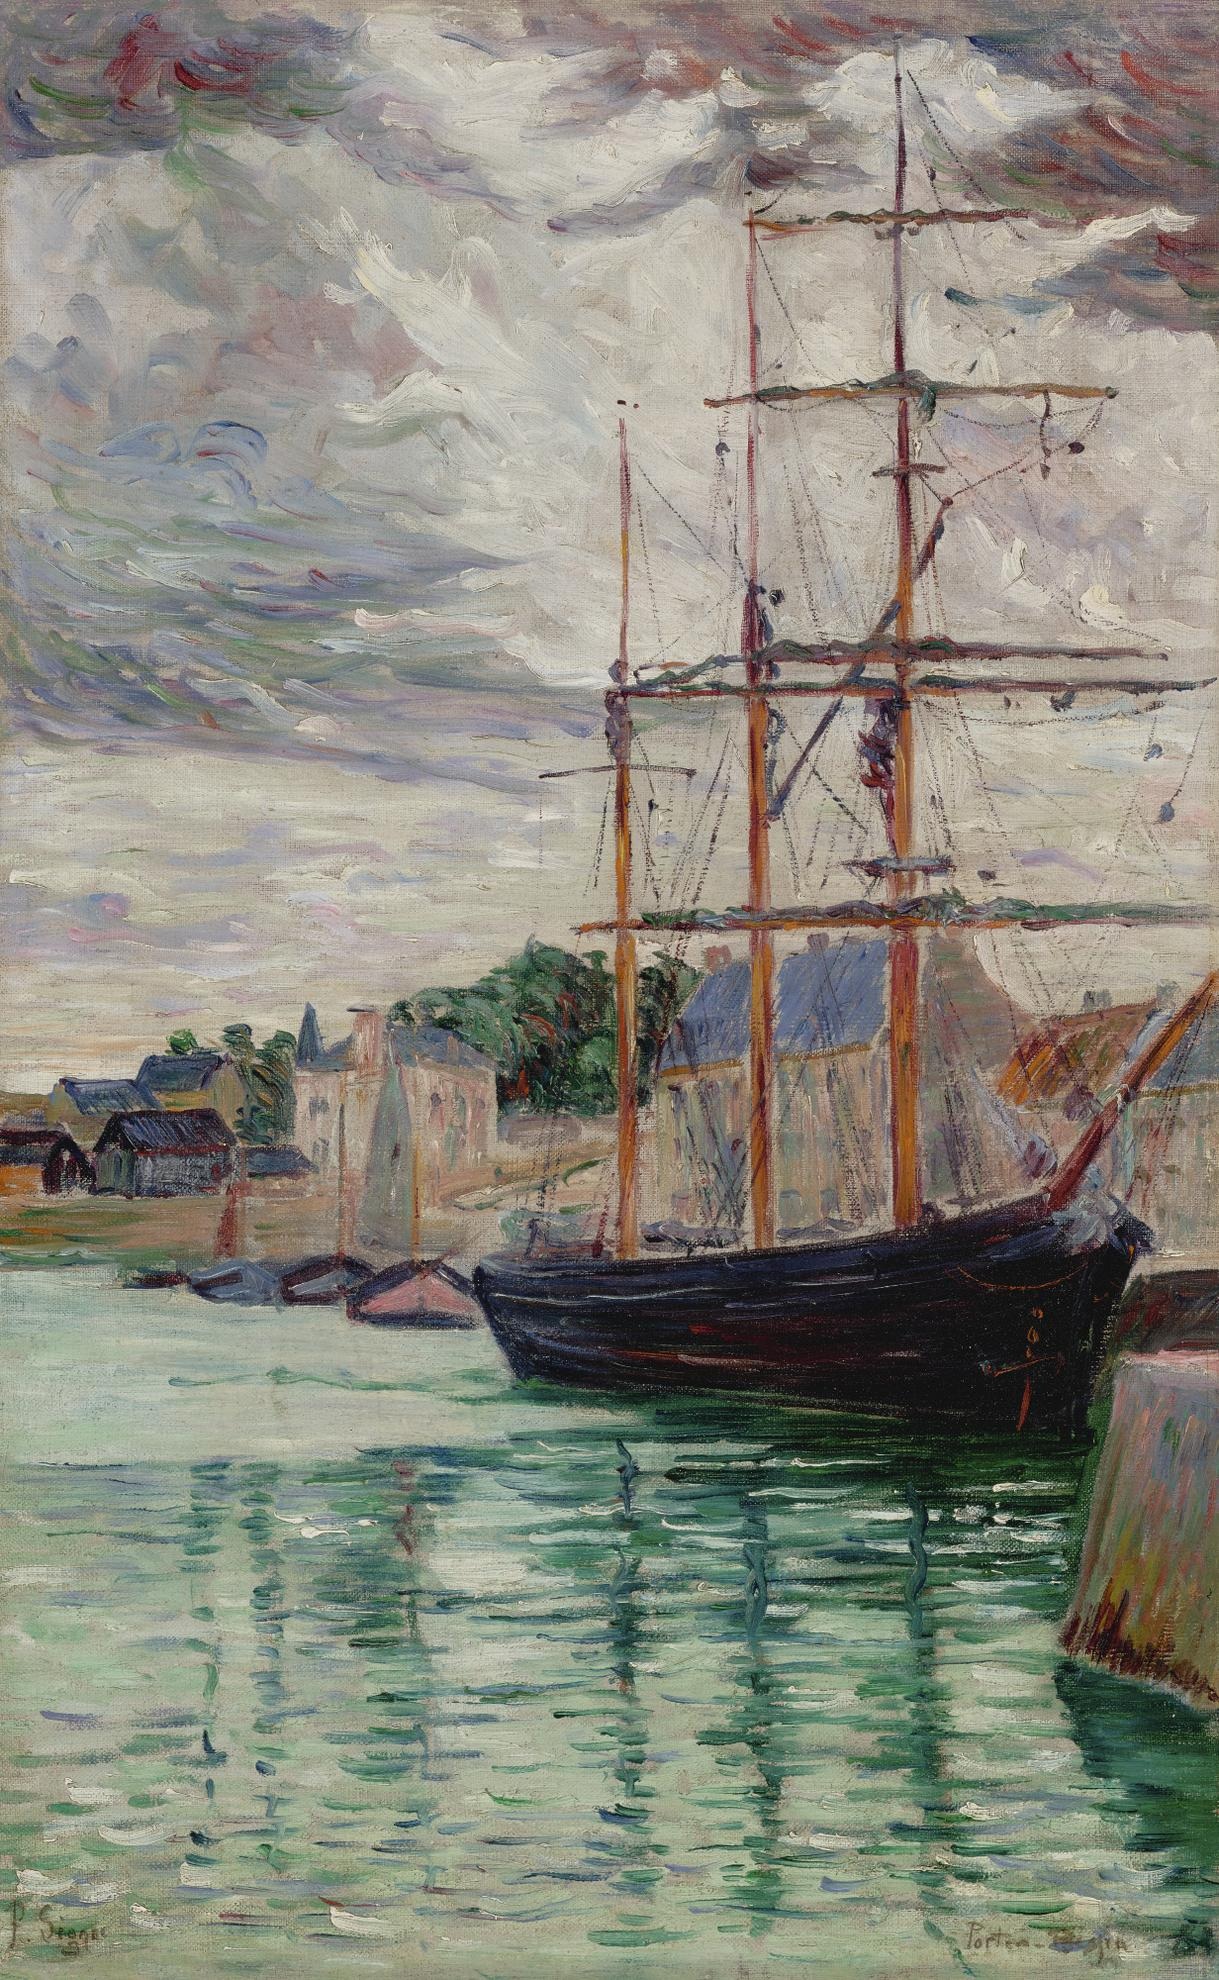 Paul Signac-Port-En-Bessin, Le Trois-Mats A Quai-1883